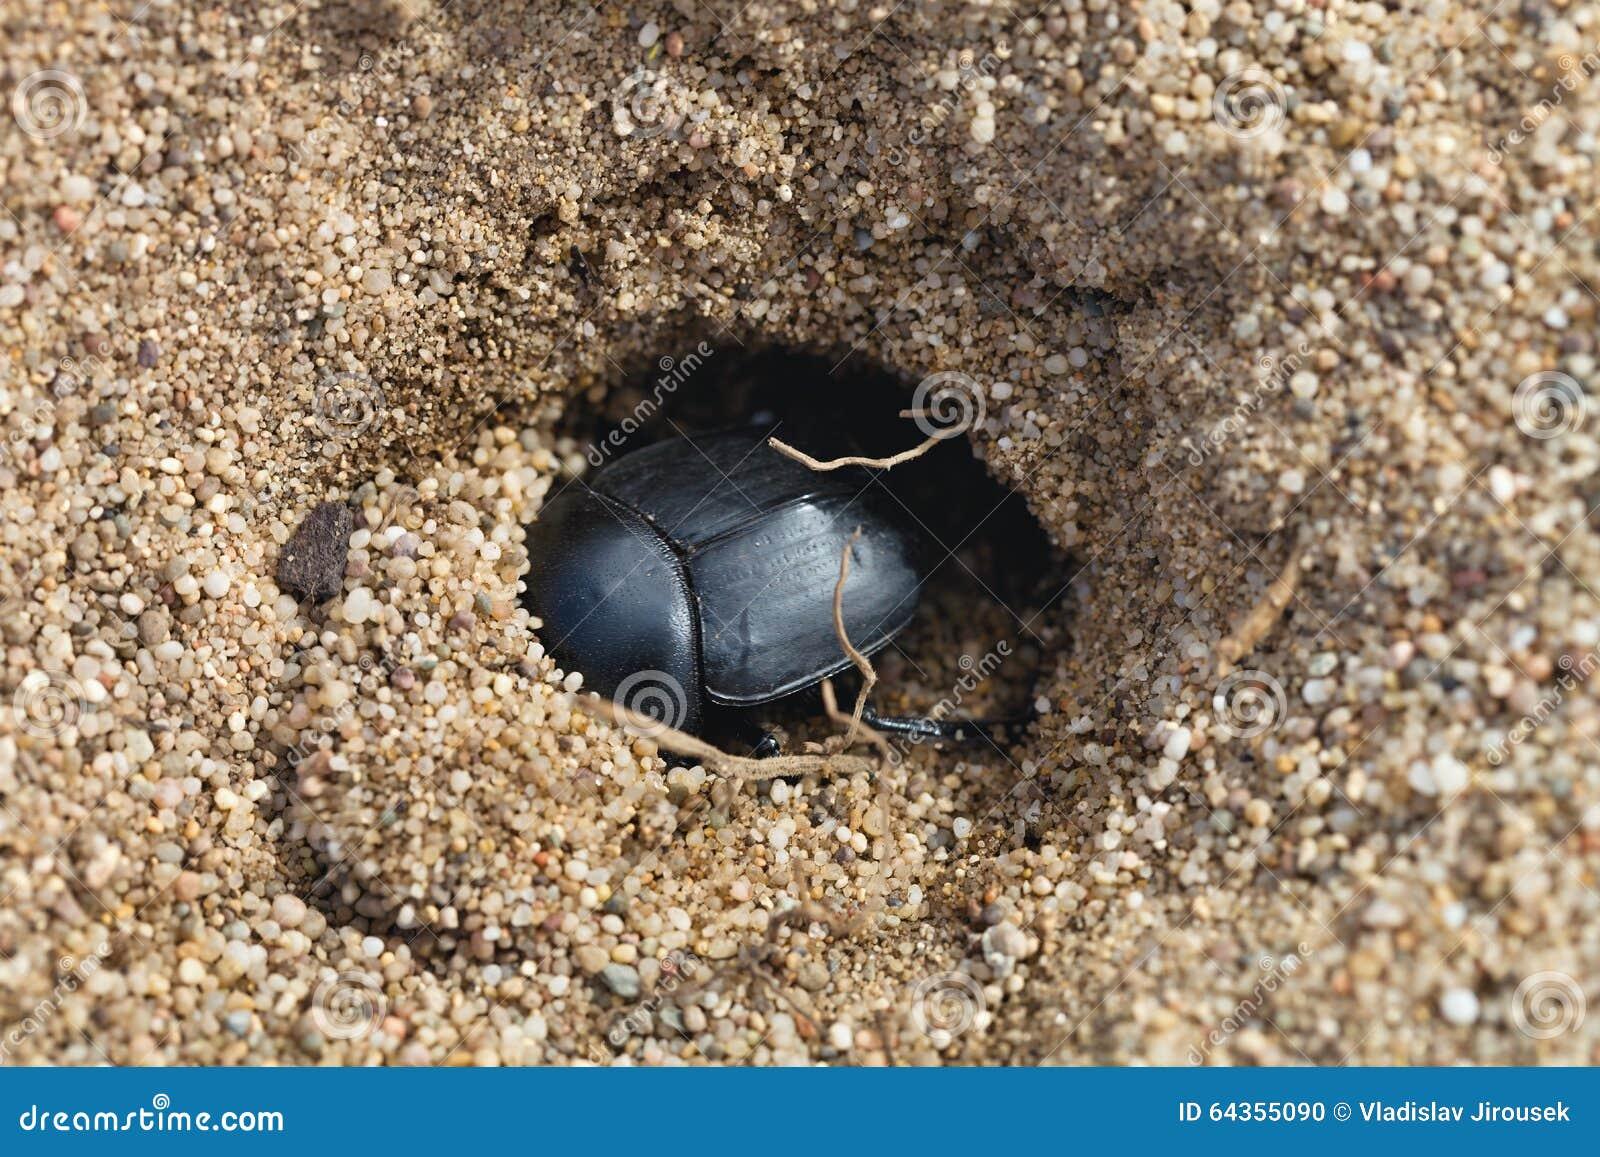 Dungbeetles w piasku, Sardinia, Włochy